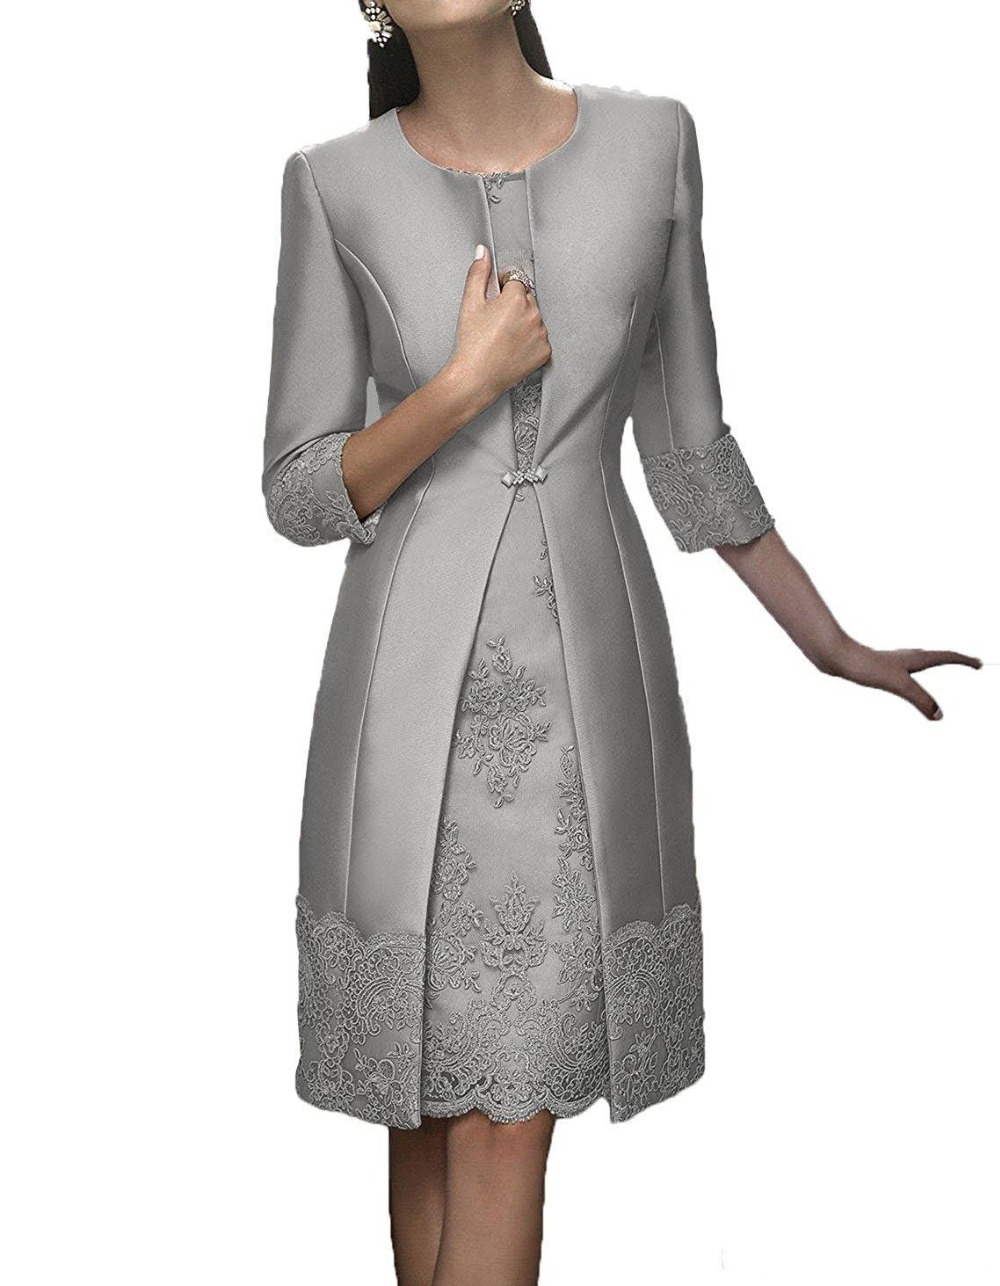 Elegant Sheath Short Mother Formal Wear Jacket Evening Satin Lace Party Wedding Guest Dress 2020 Mother Of The Bride Dresses